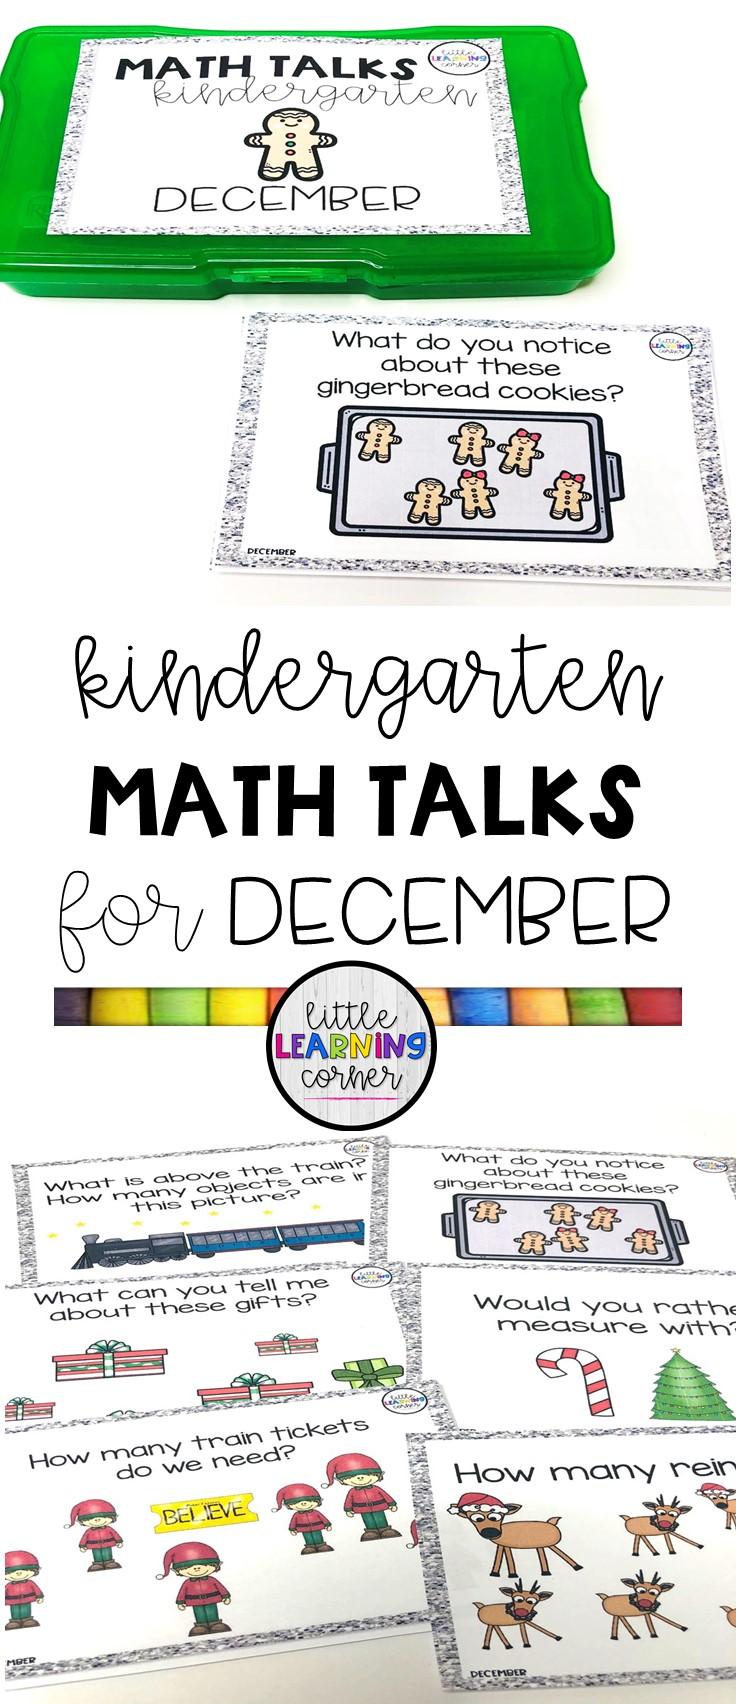 kindergarten-math-talks-december-pin